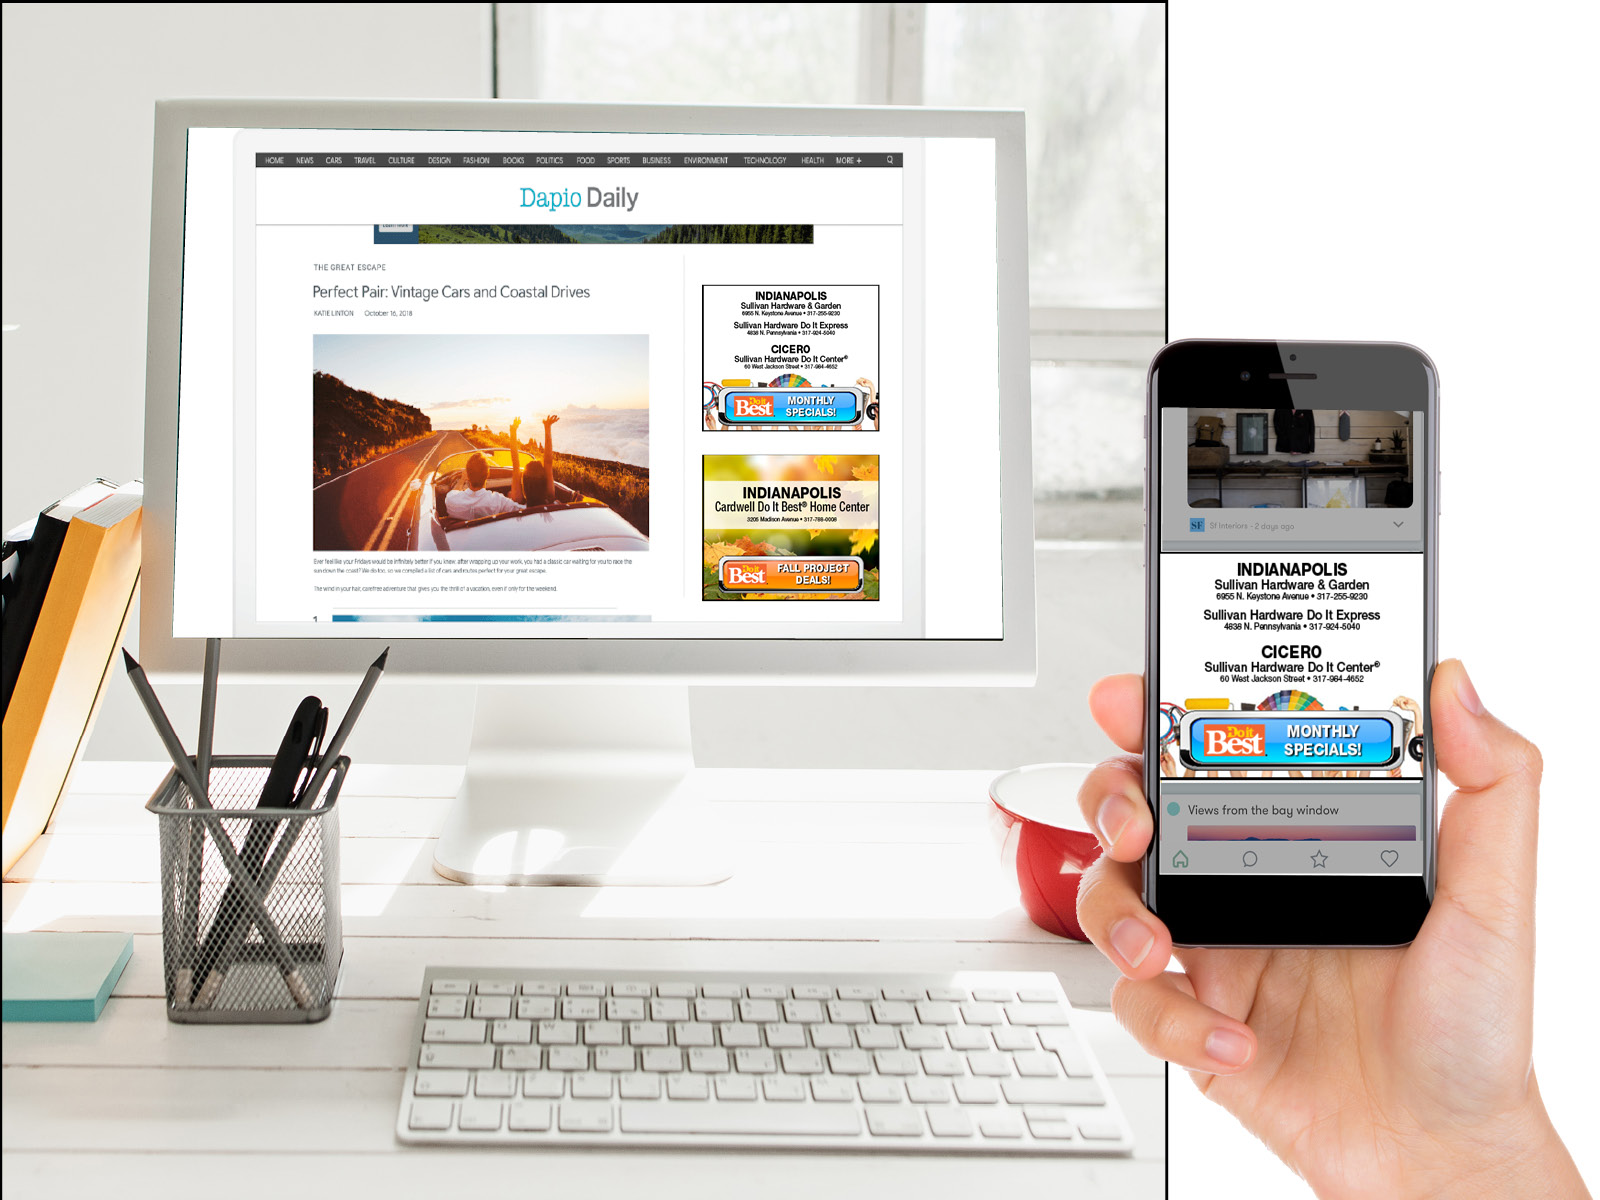 Group Digital Display Ad Samples